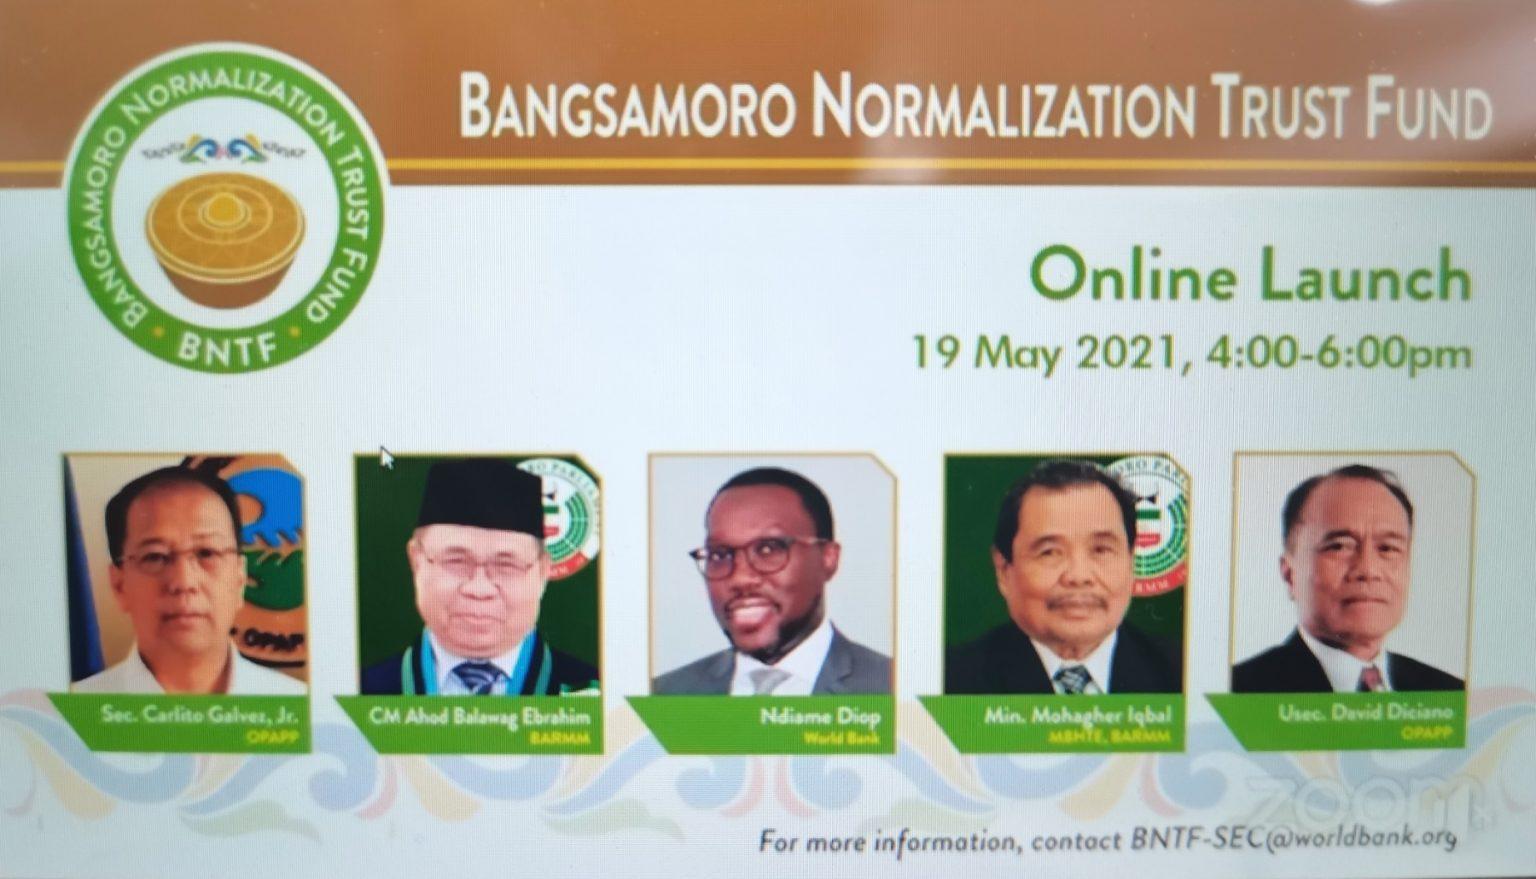 GPH-MILF, World Bank officially launch Bangsamoro